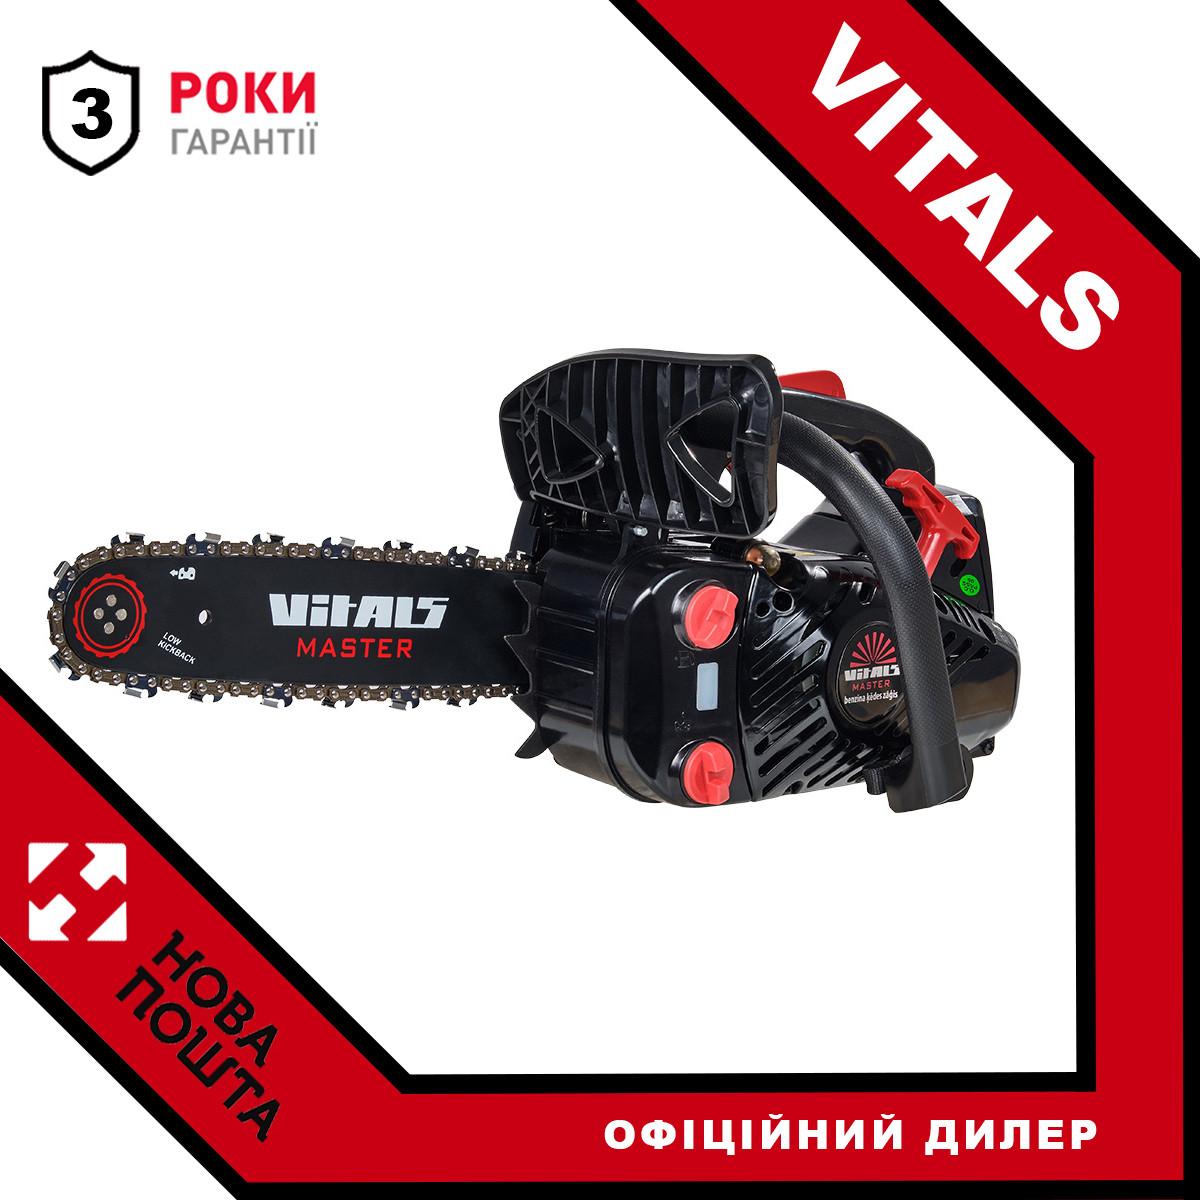 Бензопила ланцюгова Vitals Master BKZ 2511s Black Edition + В подарунок масло до бензини 2Т!